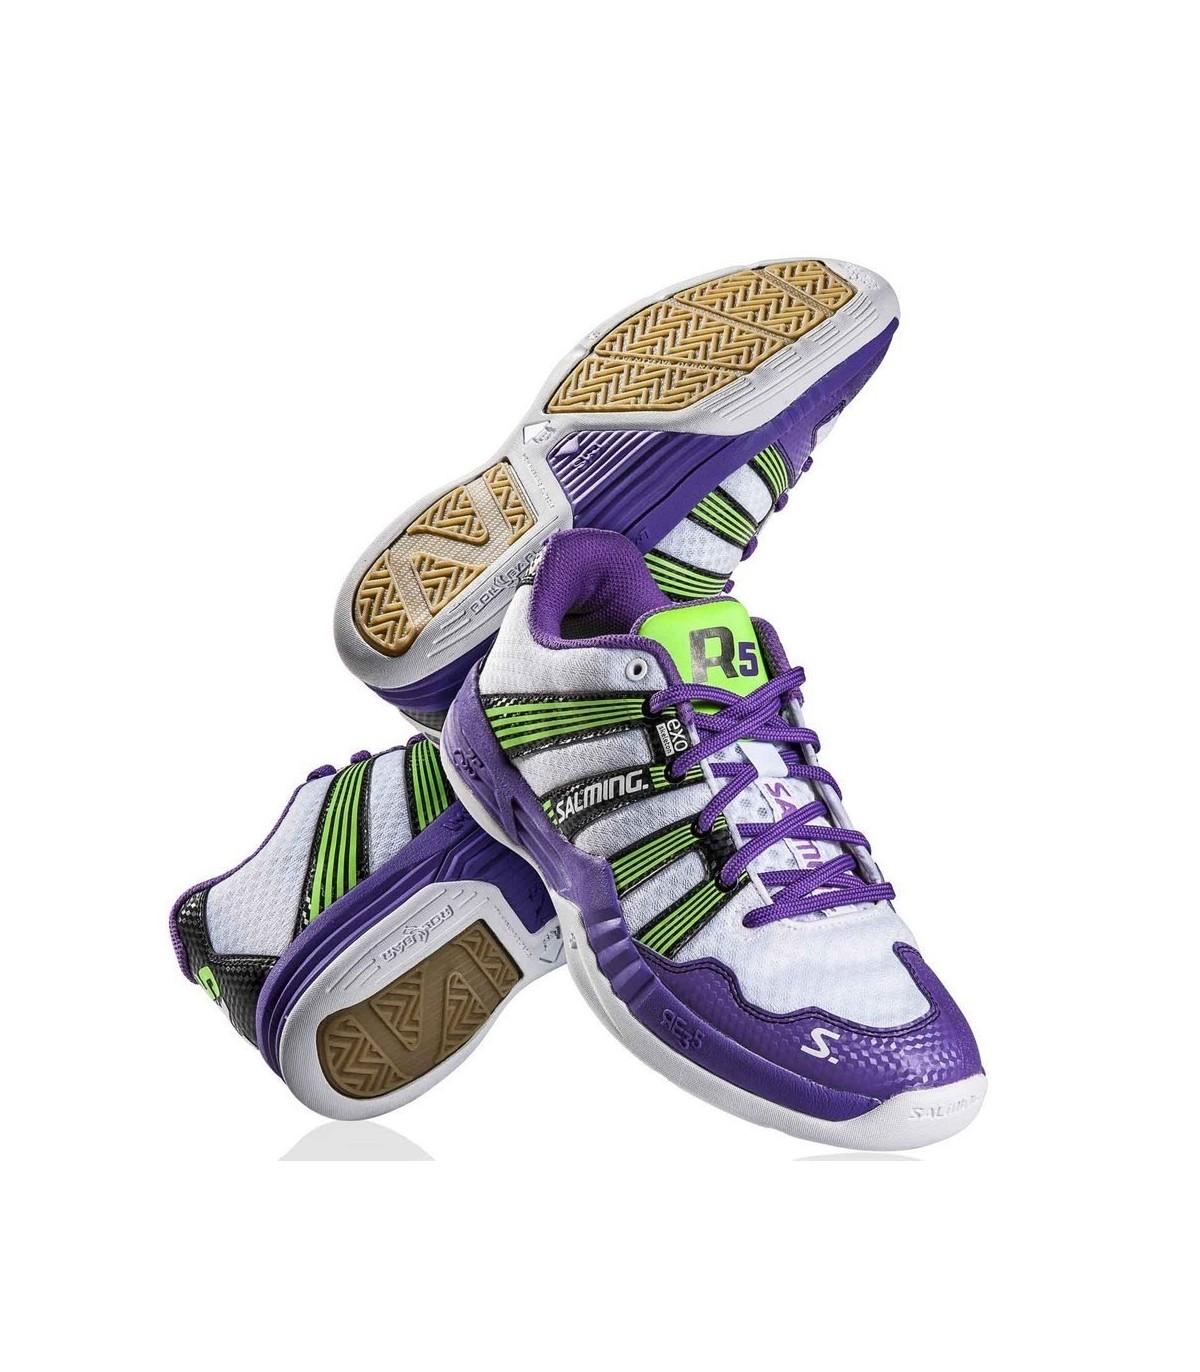 b00dc4d3729bea White   Purple Salming Race R5 2.0 Women Squash Shoes